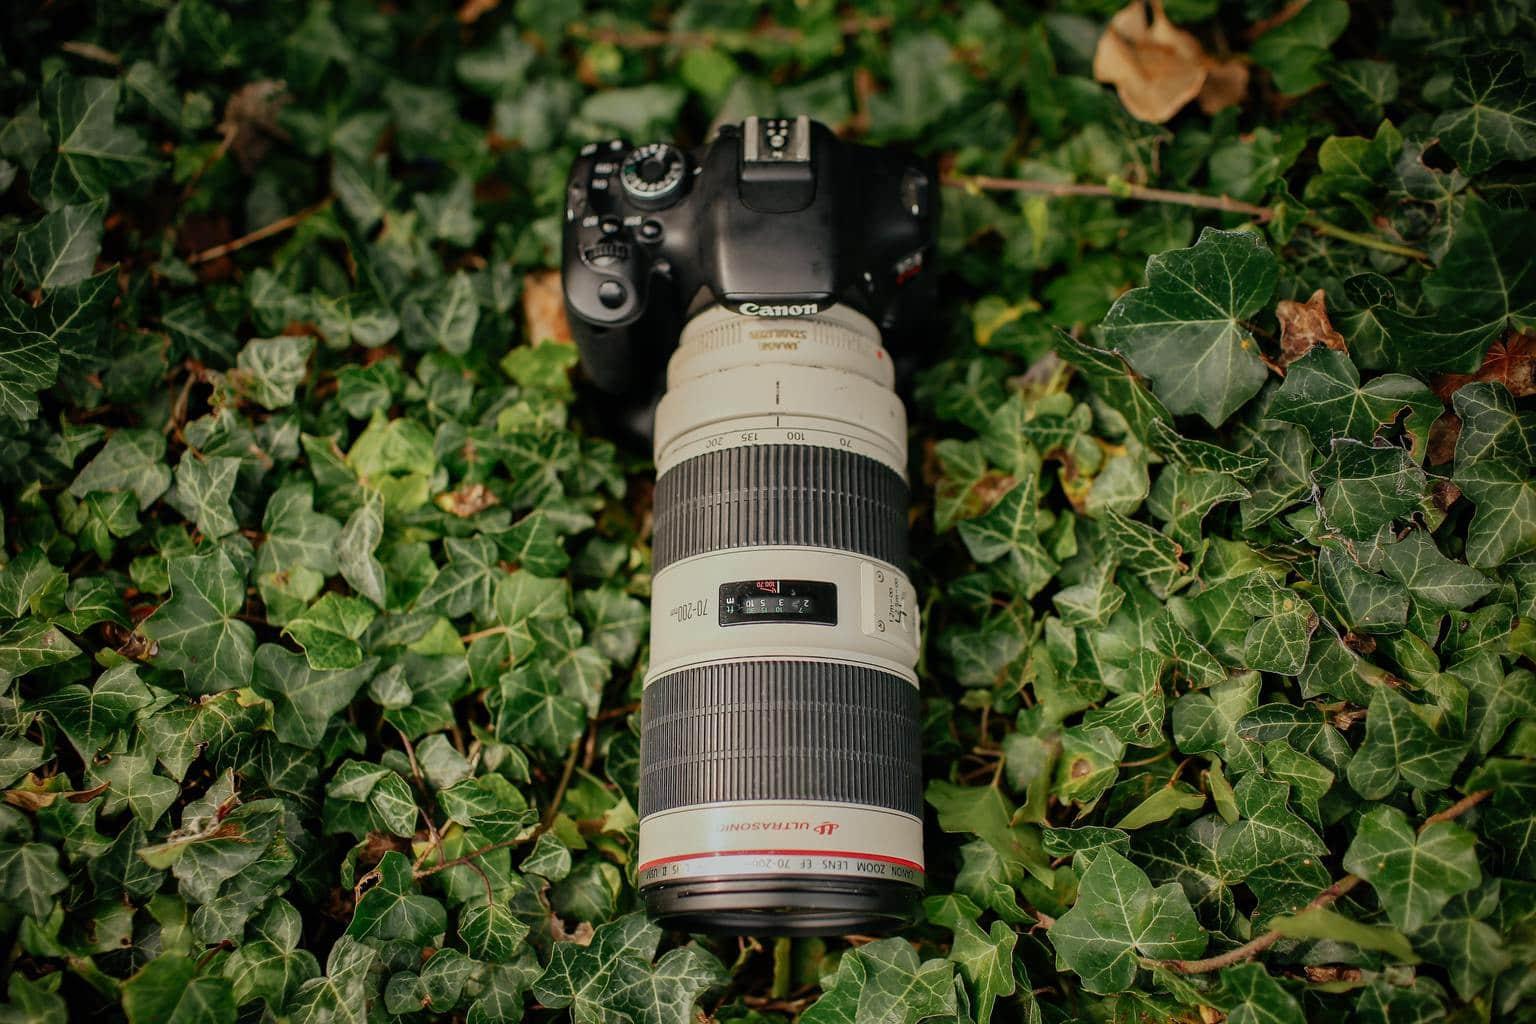 Objetivo de Canon de color blanco de la serie L